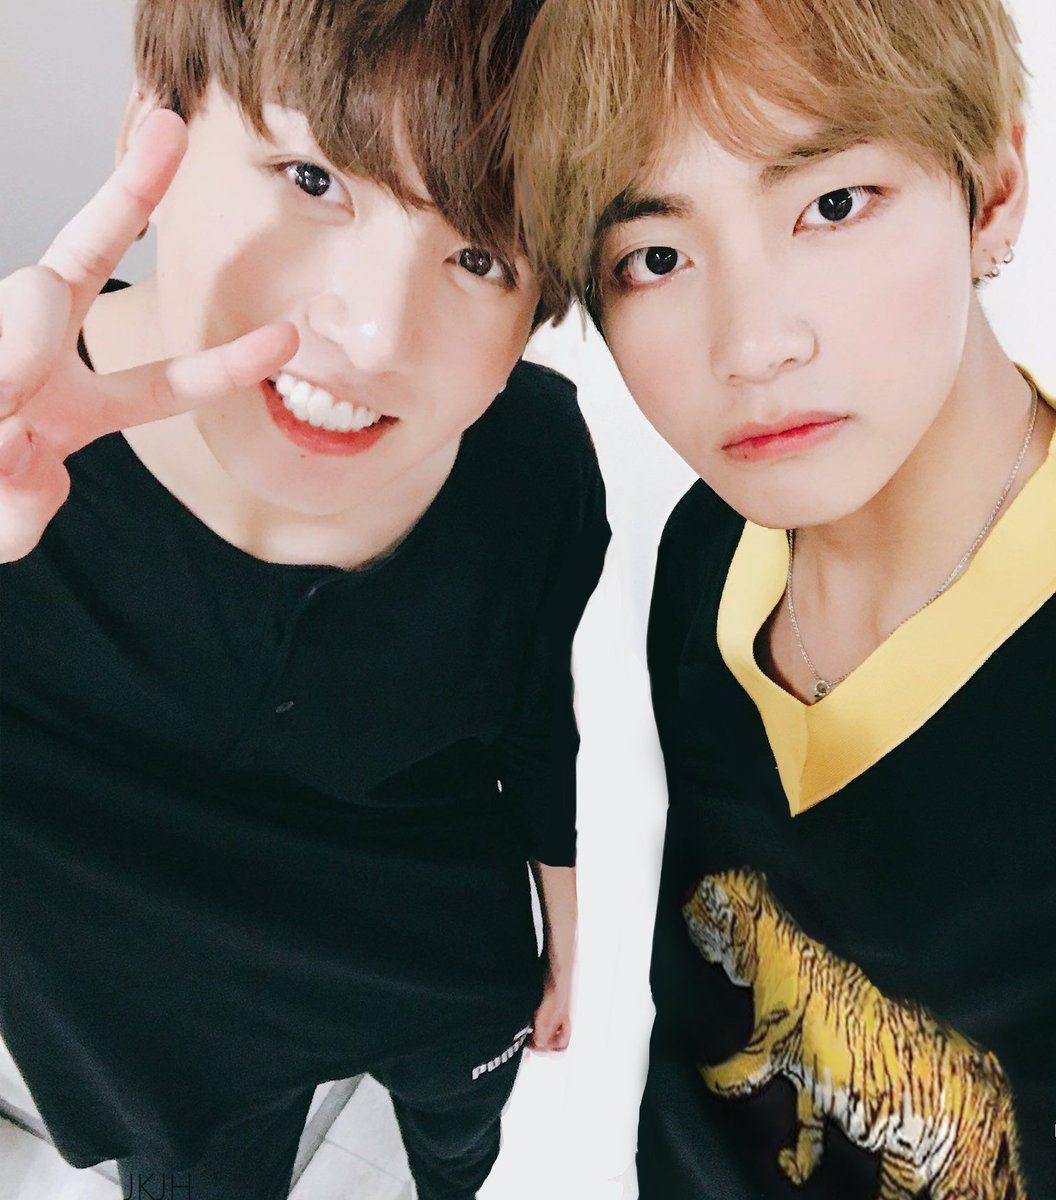 H A R D C O R E   BTS   Bts, Taekook, Bts jungkook